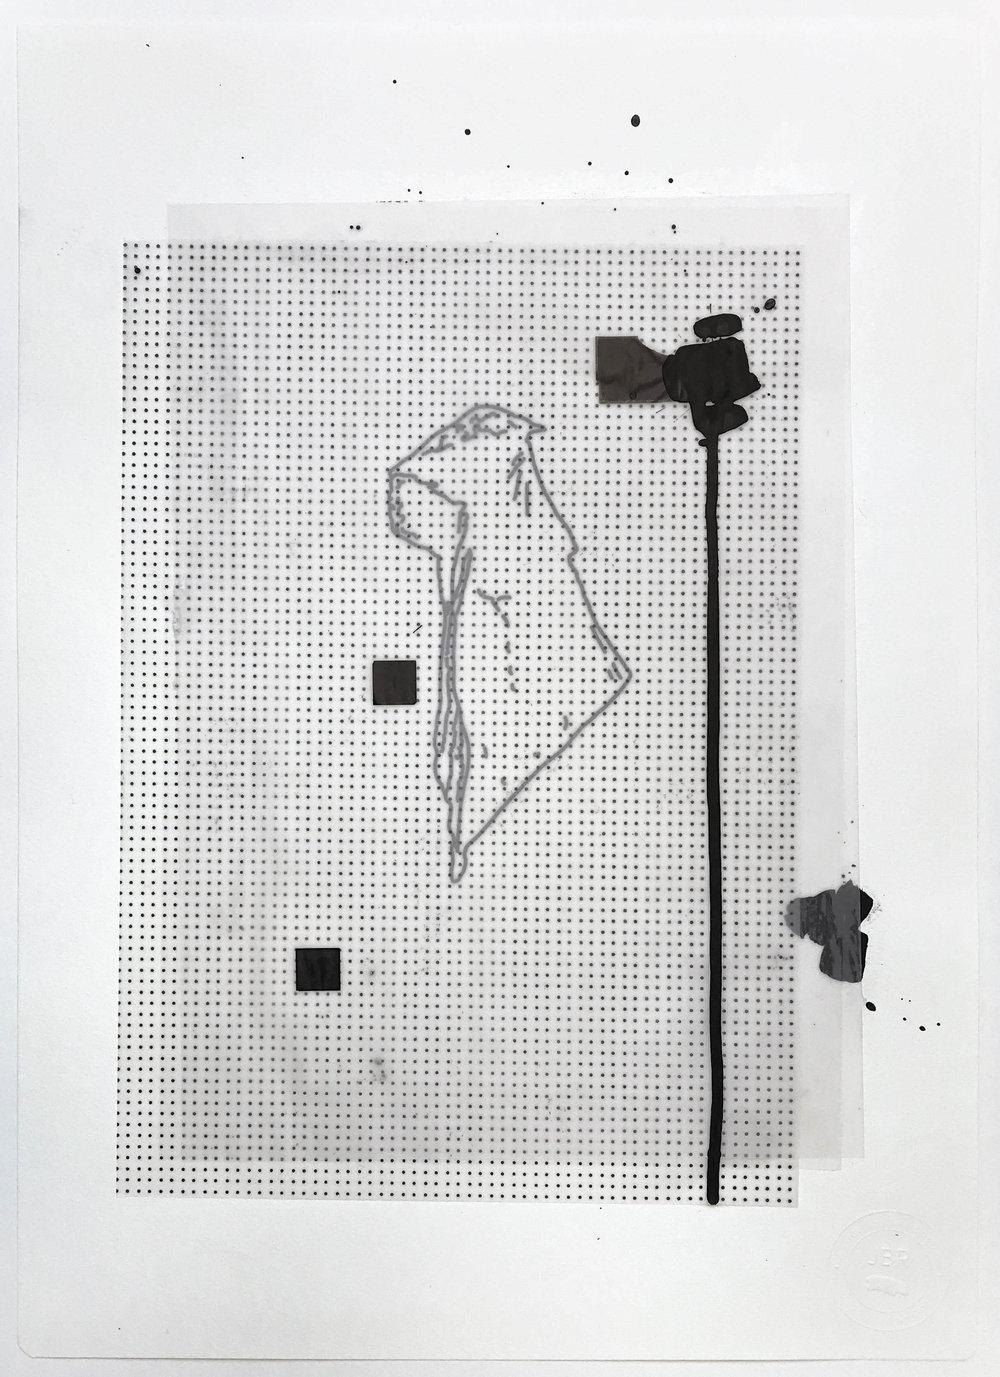 %22Destrozando la cabina%22- Técnica mixta  - 42 x 30 cm - Julián Brangold - 2018.jpg